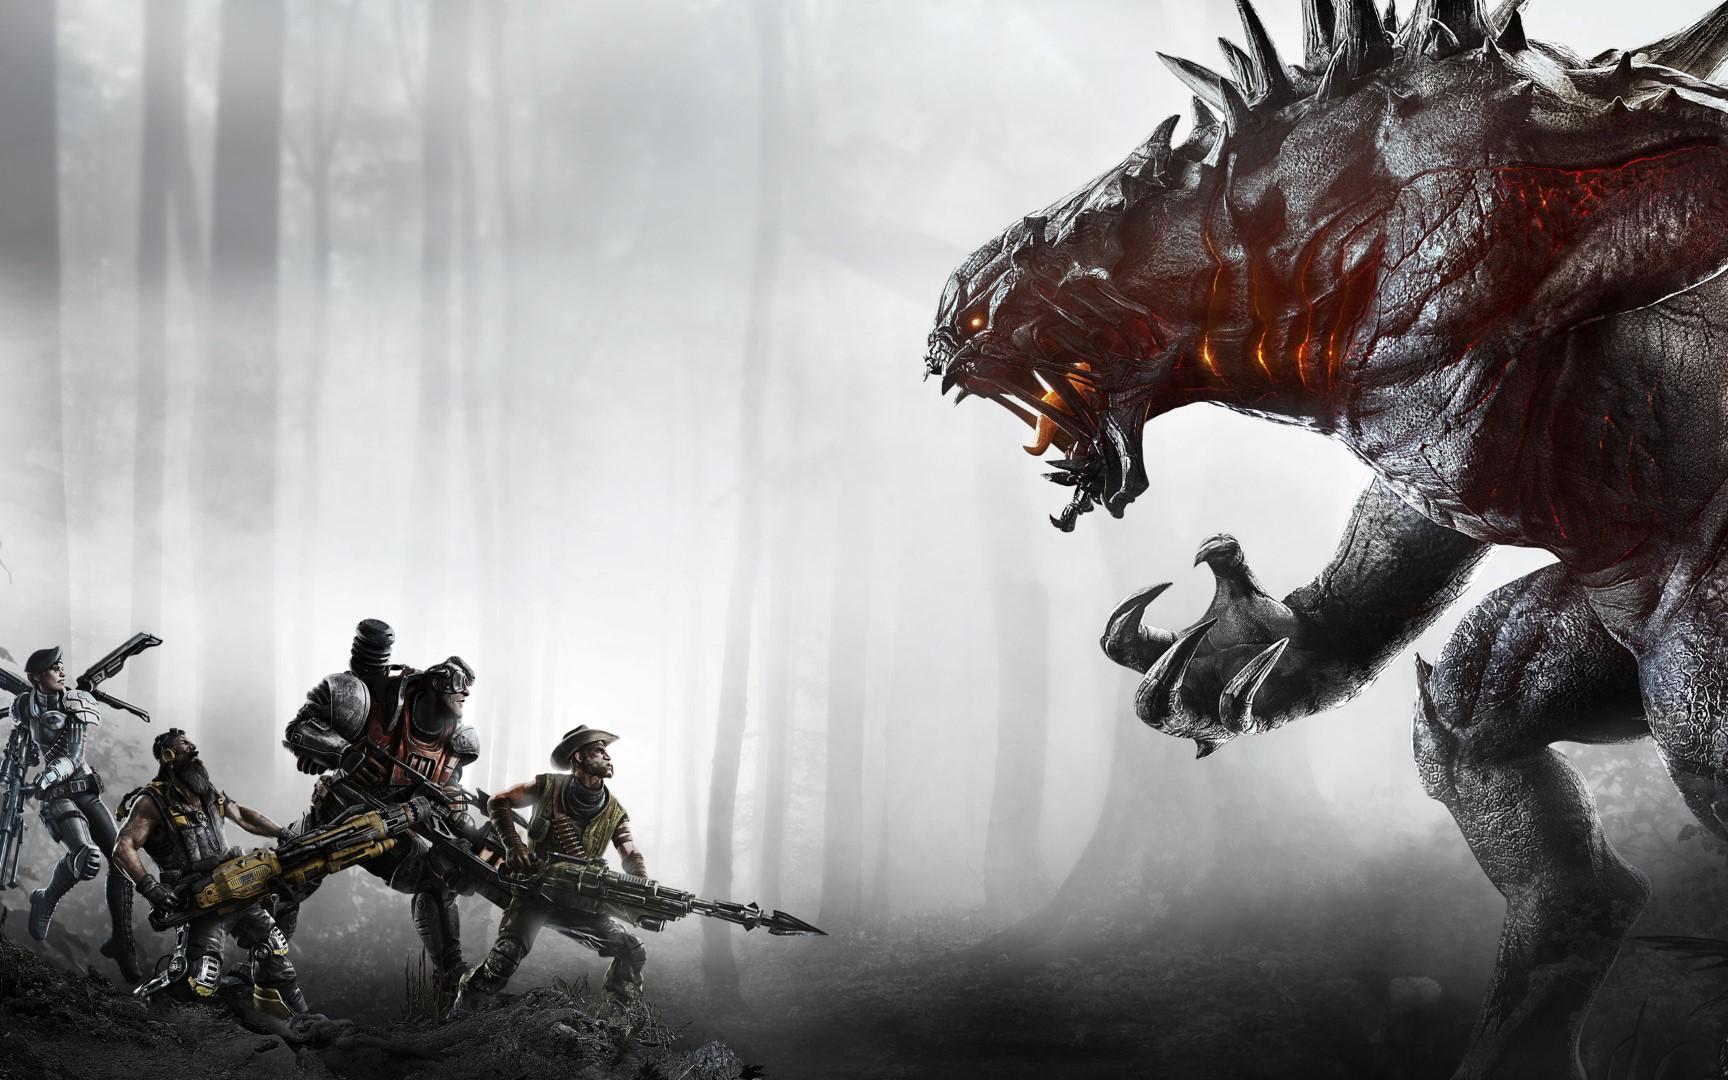 http://www.czechgamer.com/pics/clanky/22116_evolve-2015-game-wide-1446558930.jpg